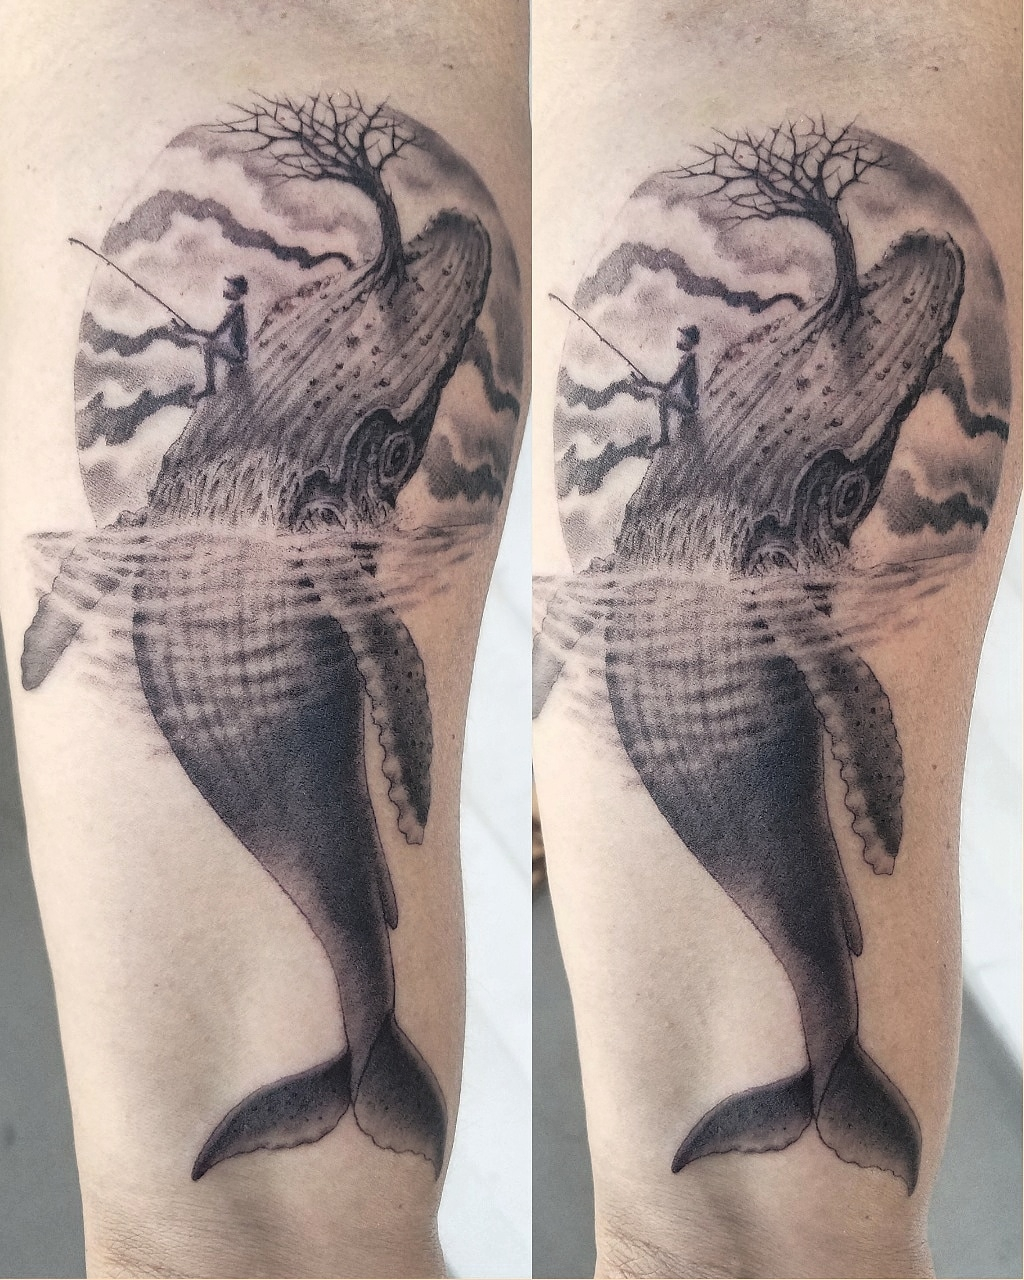 Still Life Tattoo - store  | Photo 8 of 10 | Address: 1500 CA-1 suite f, Seal Beach, CA 90740, USA | Phone: (562) 296-8066